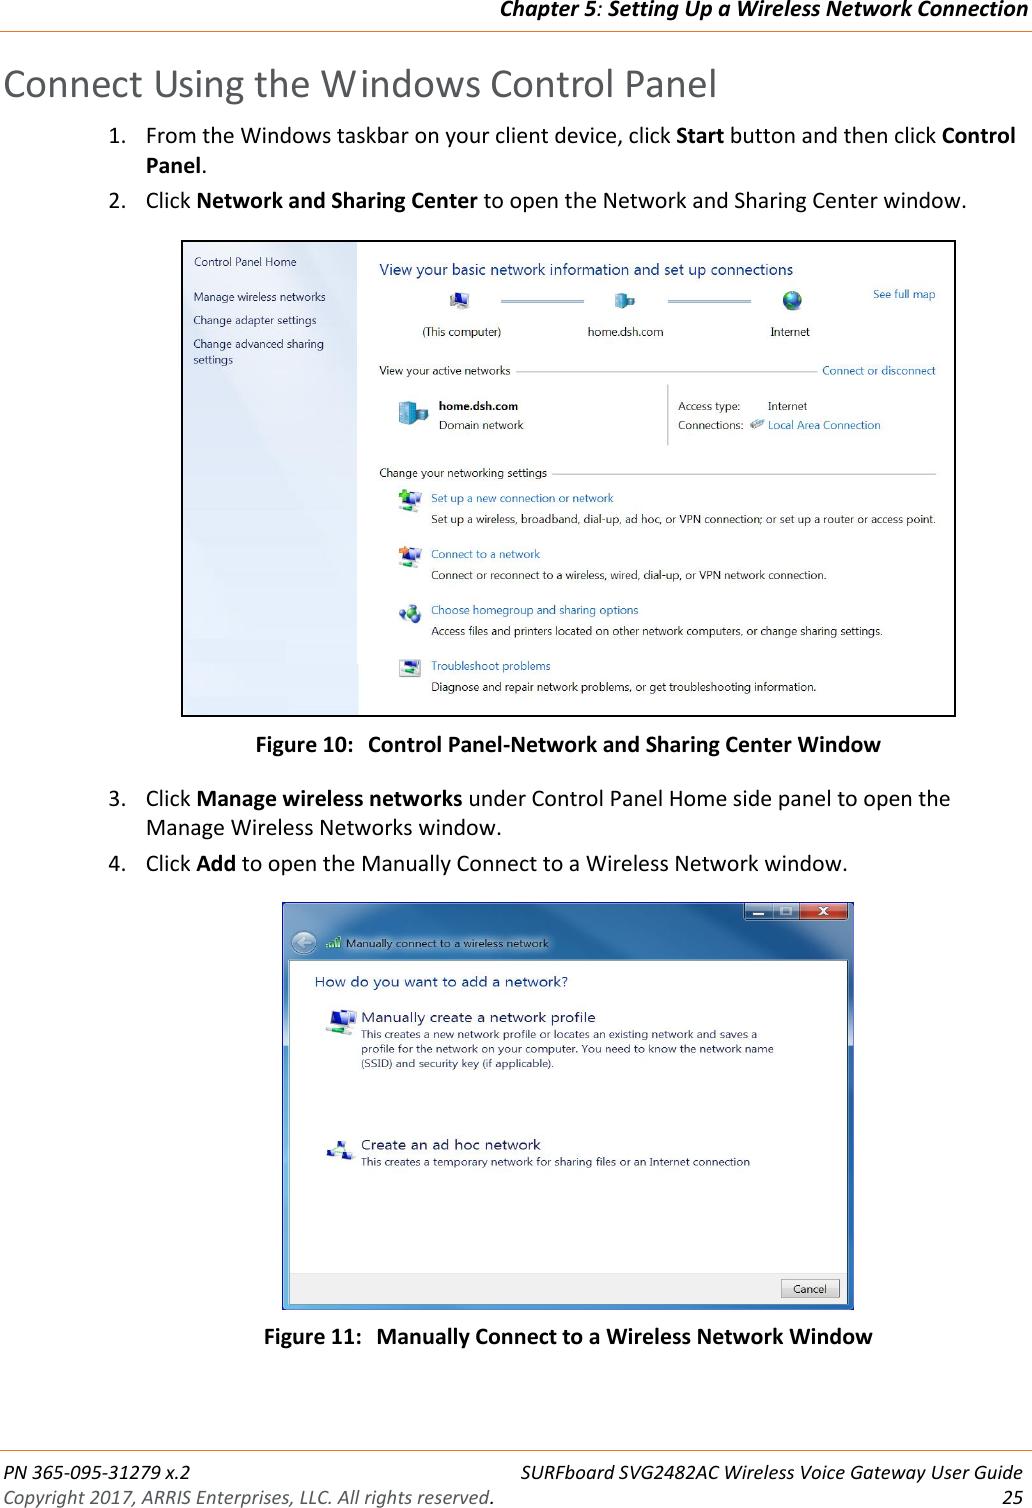 Arris SVG2482AC User Guide Manual SVG2482AC: UG